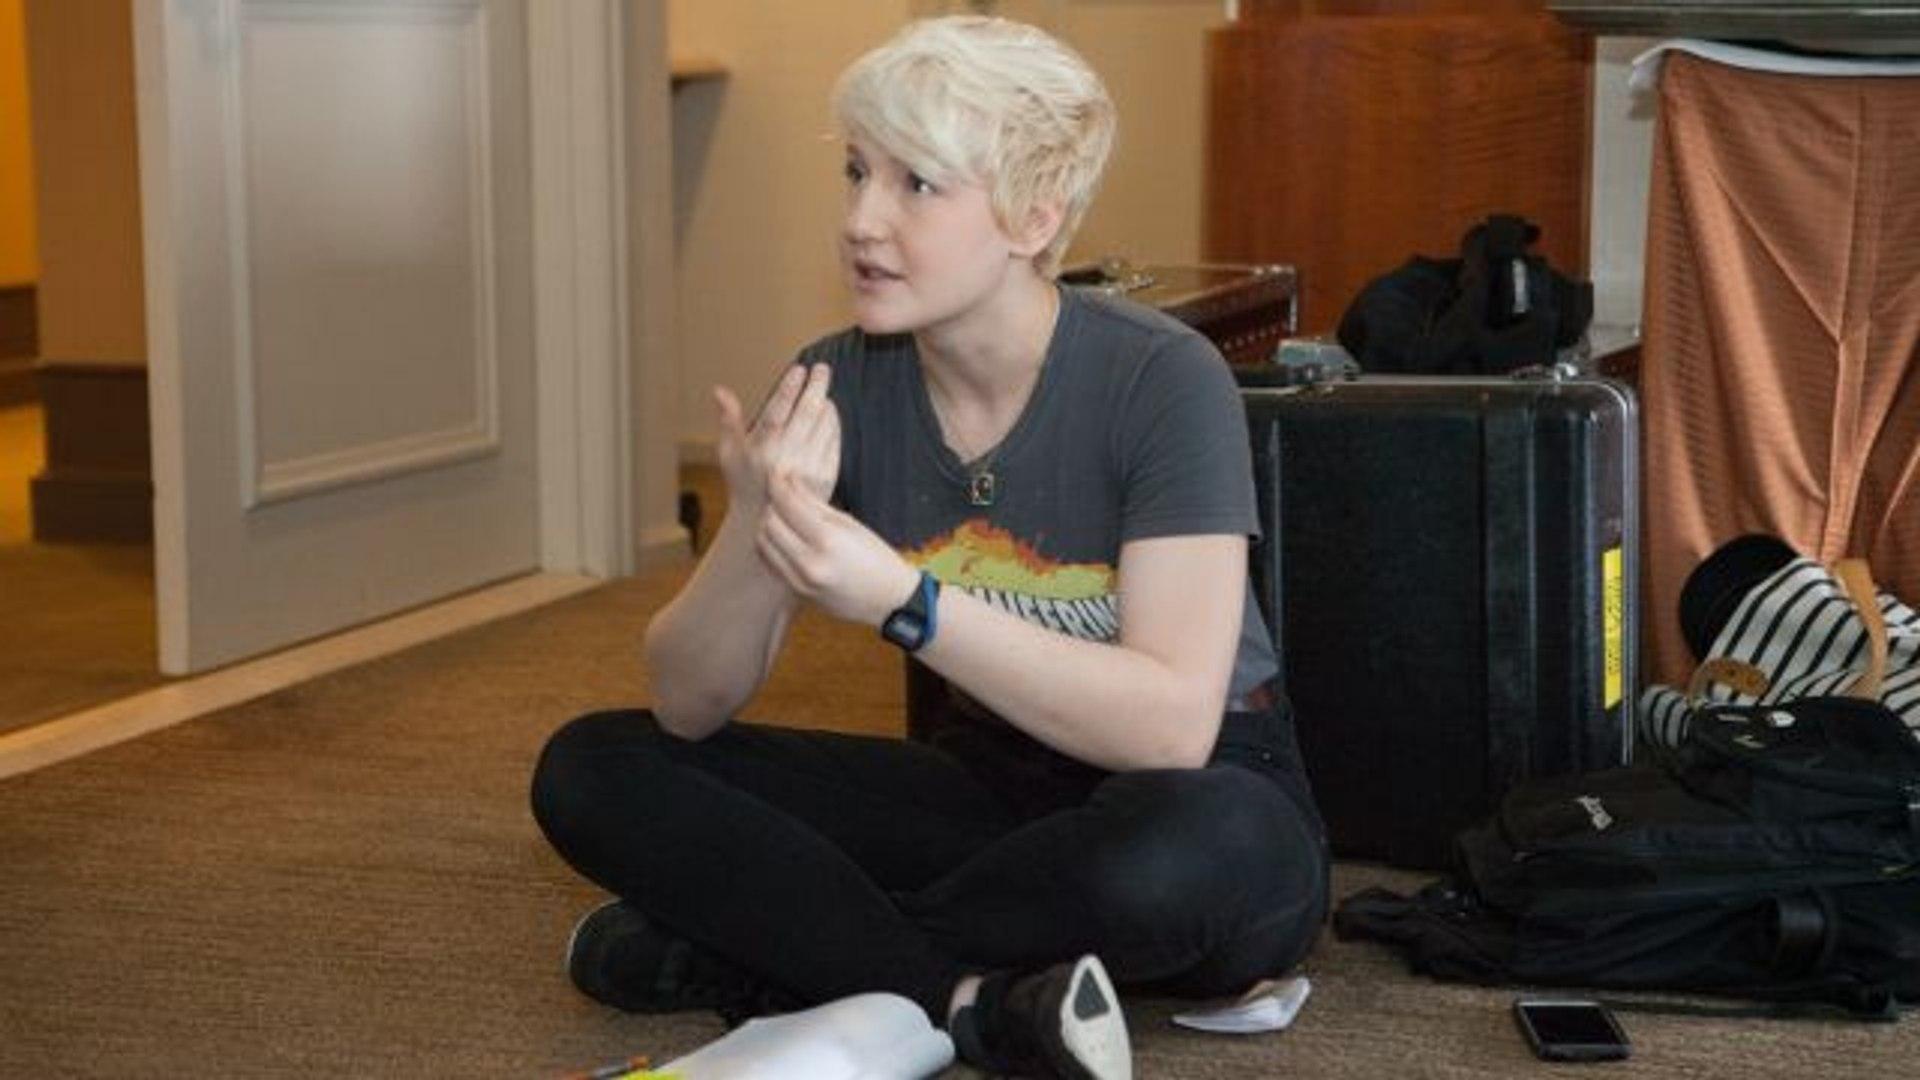 Teen Technorati  - Meet Catherine Ray—A 2014 Thiel Fellow and Mathematics Wunderkind